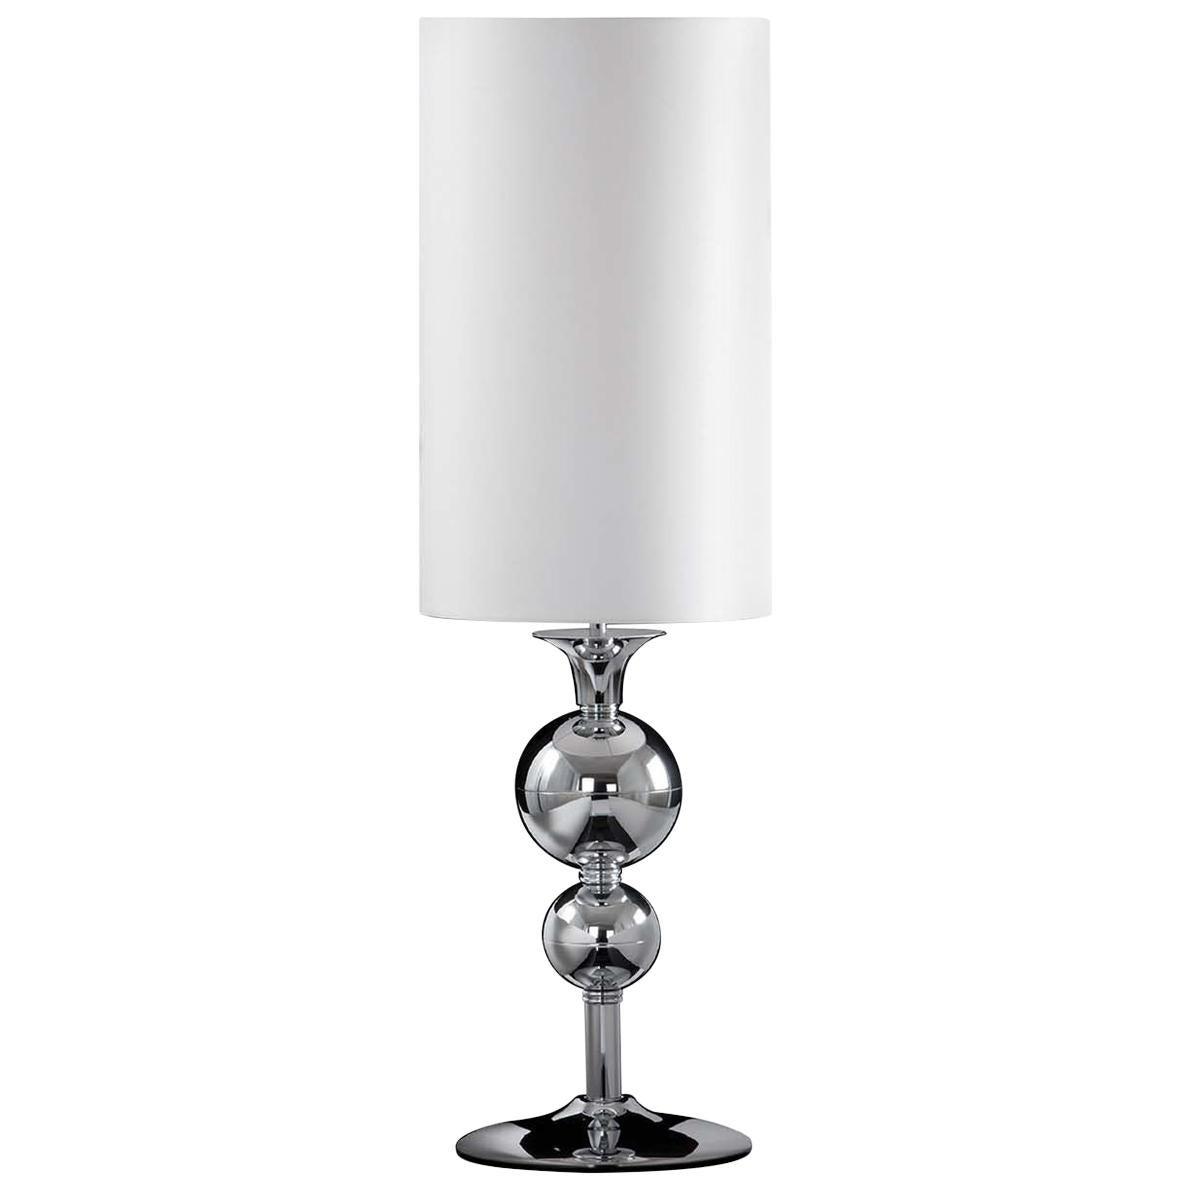 Ginevra Table Lamp